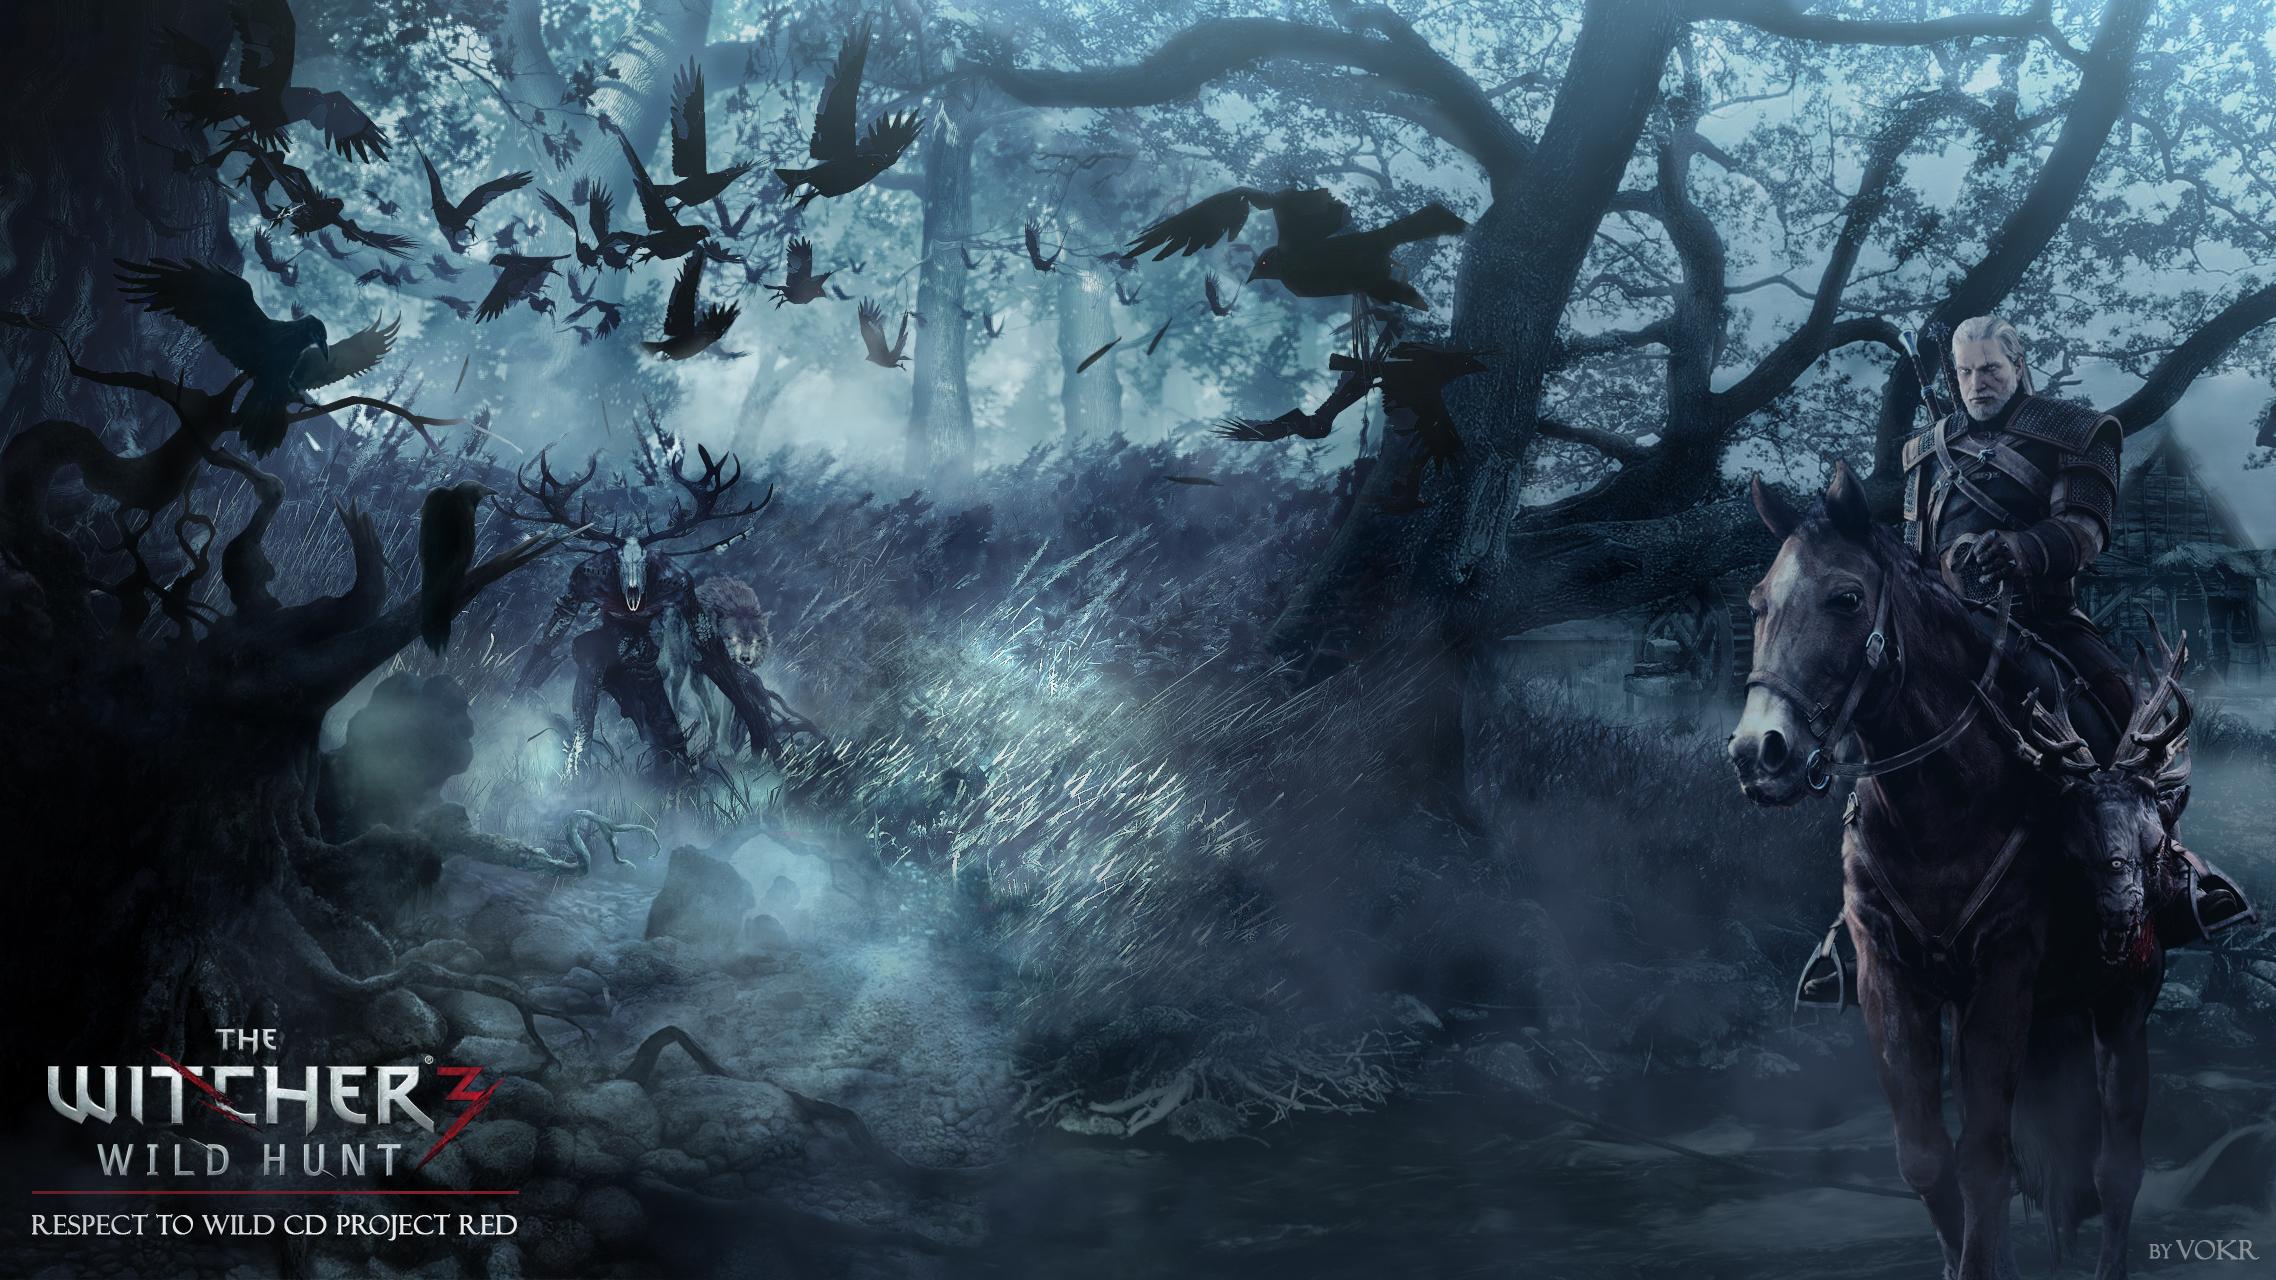 100+ EPIC Best Witcher 3 4k Wallpaper Reddit - best wallpaper